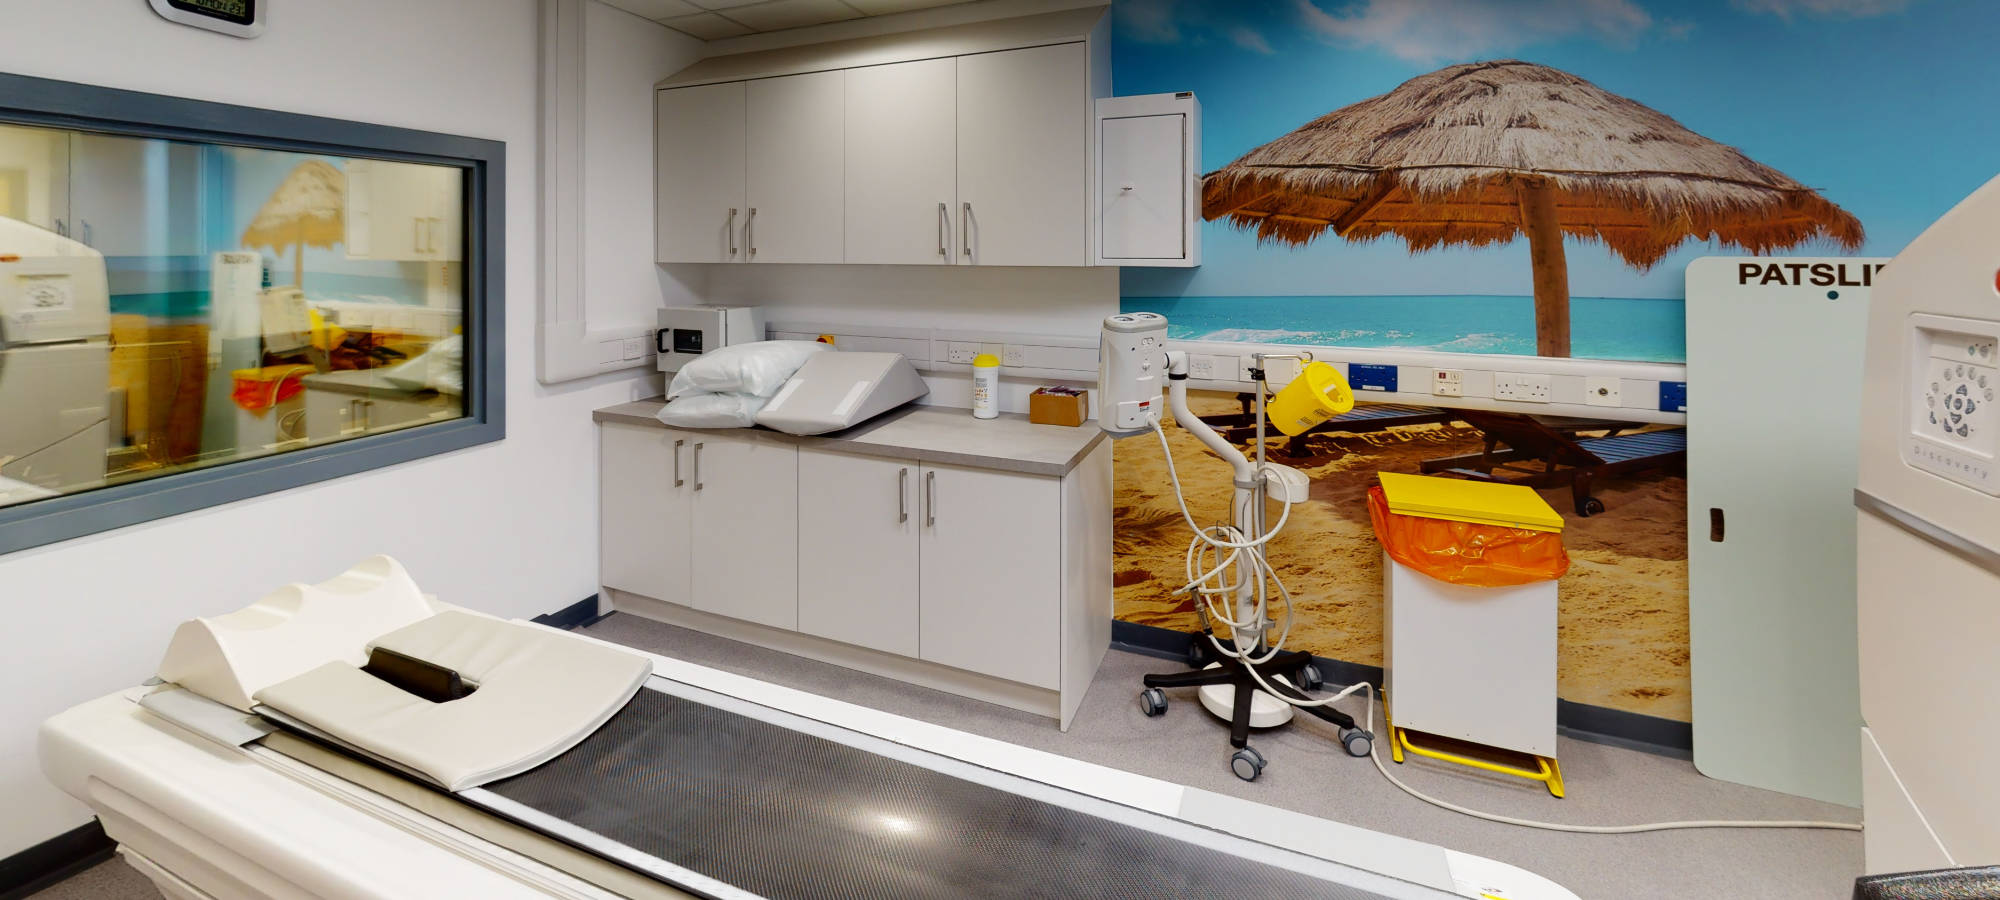 GE Digital PET CT sacnner installed by Imaging Matters